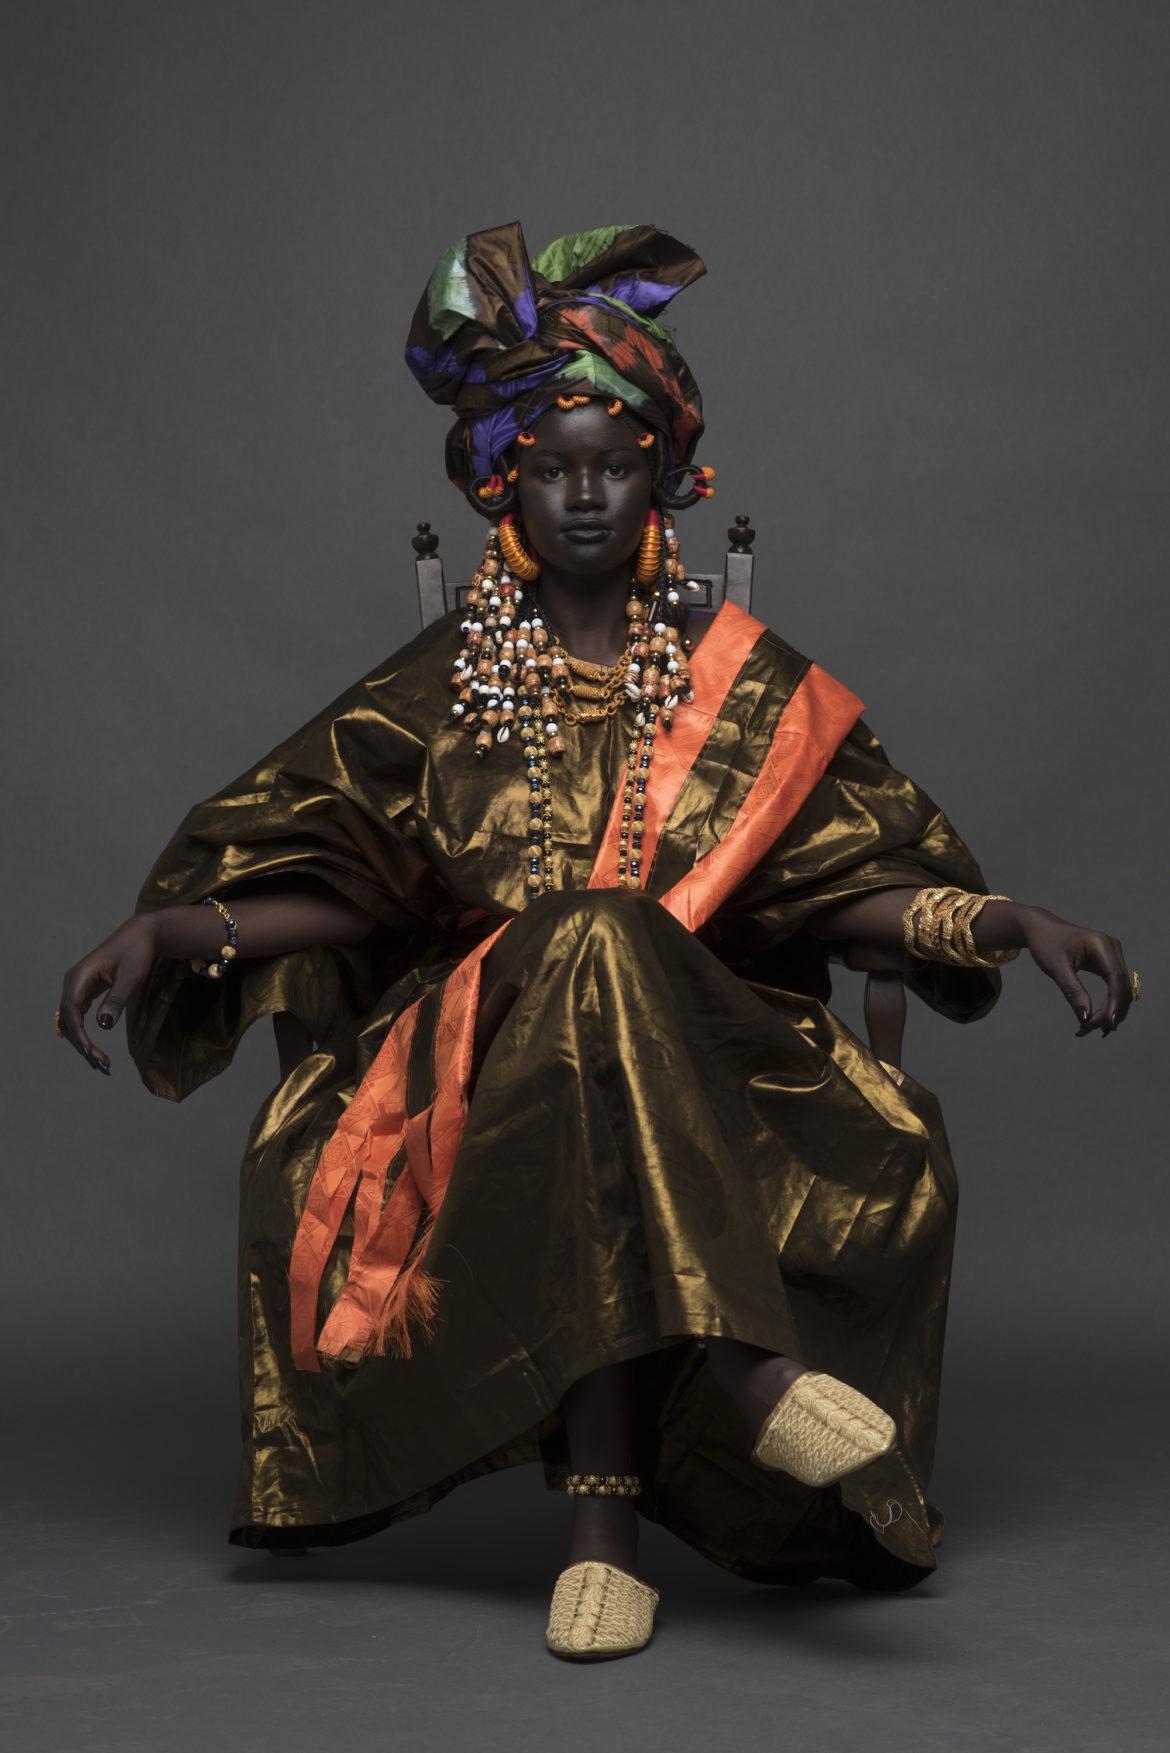 Model system beautiful woman - 3 8